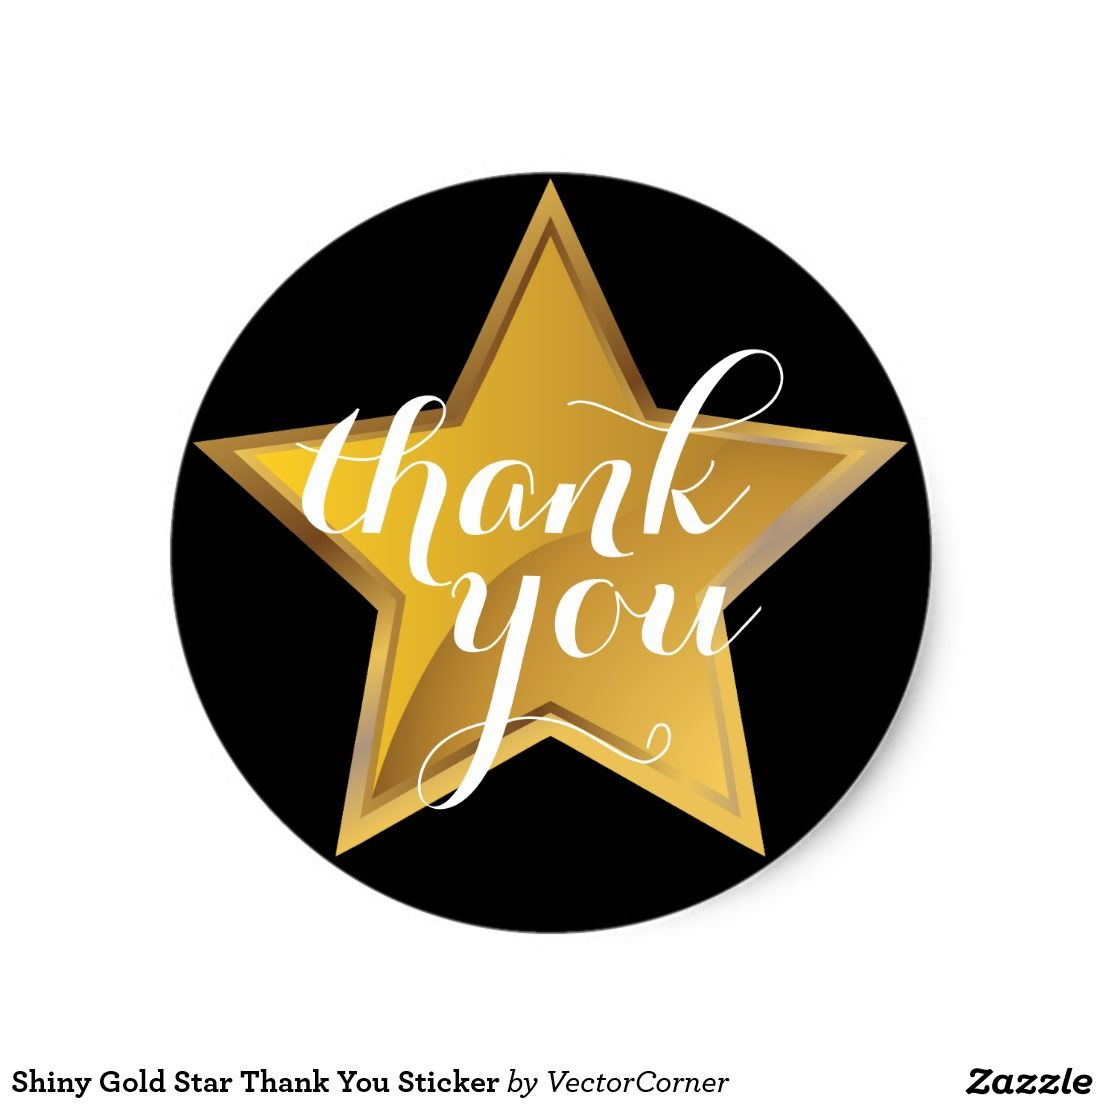 Shiny Gold Star Thank You Sticker